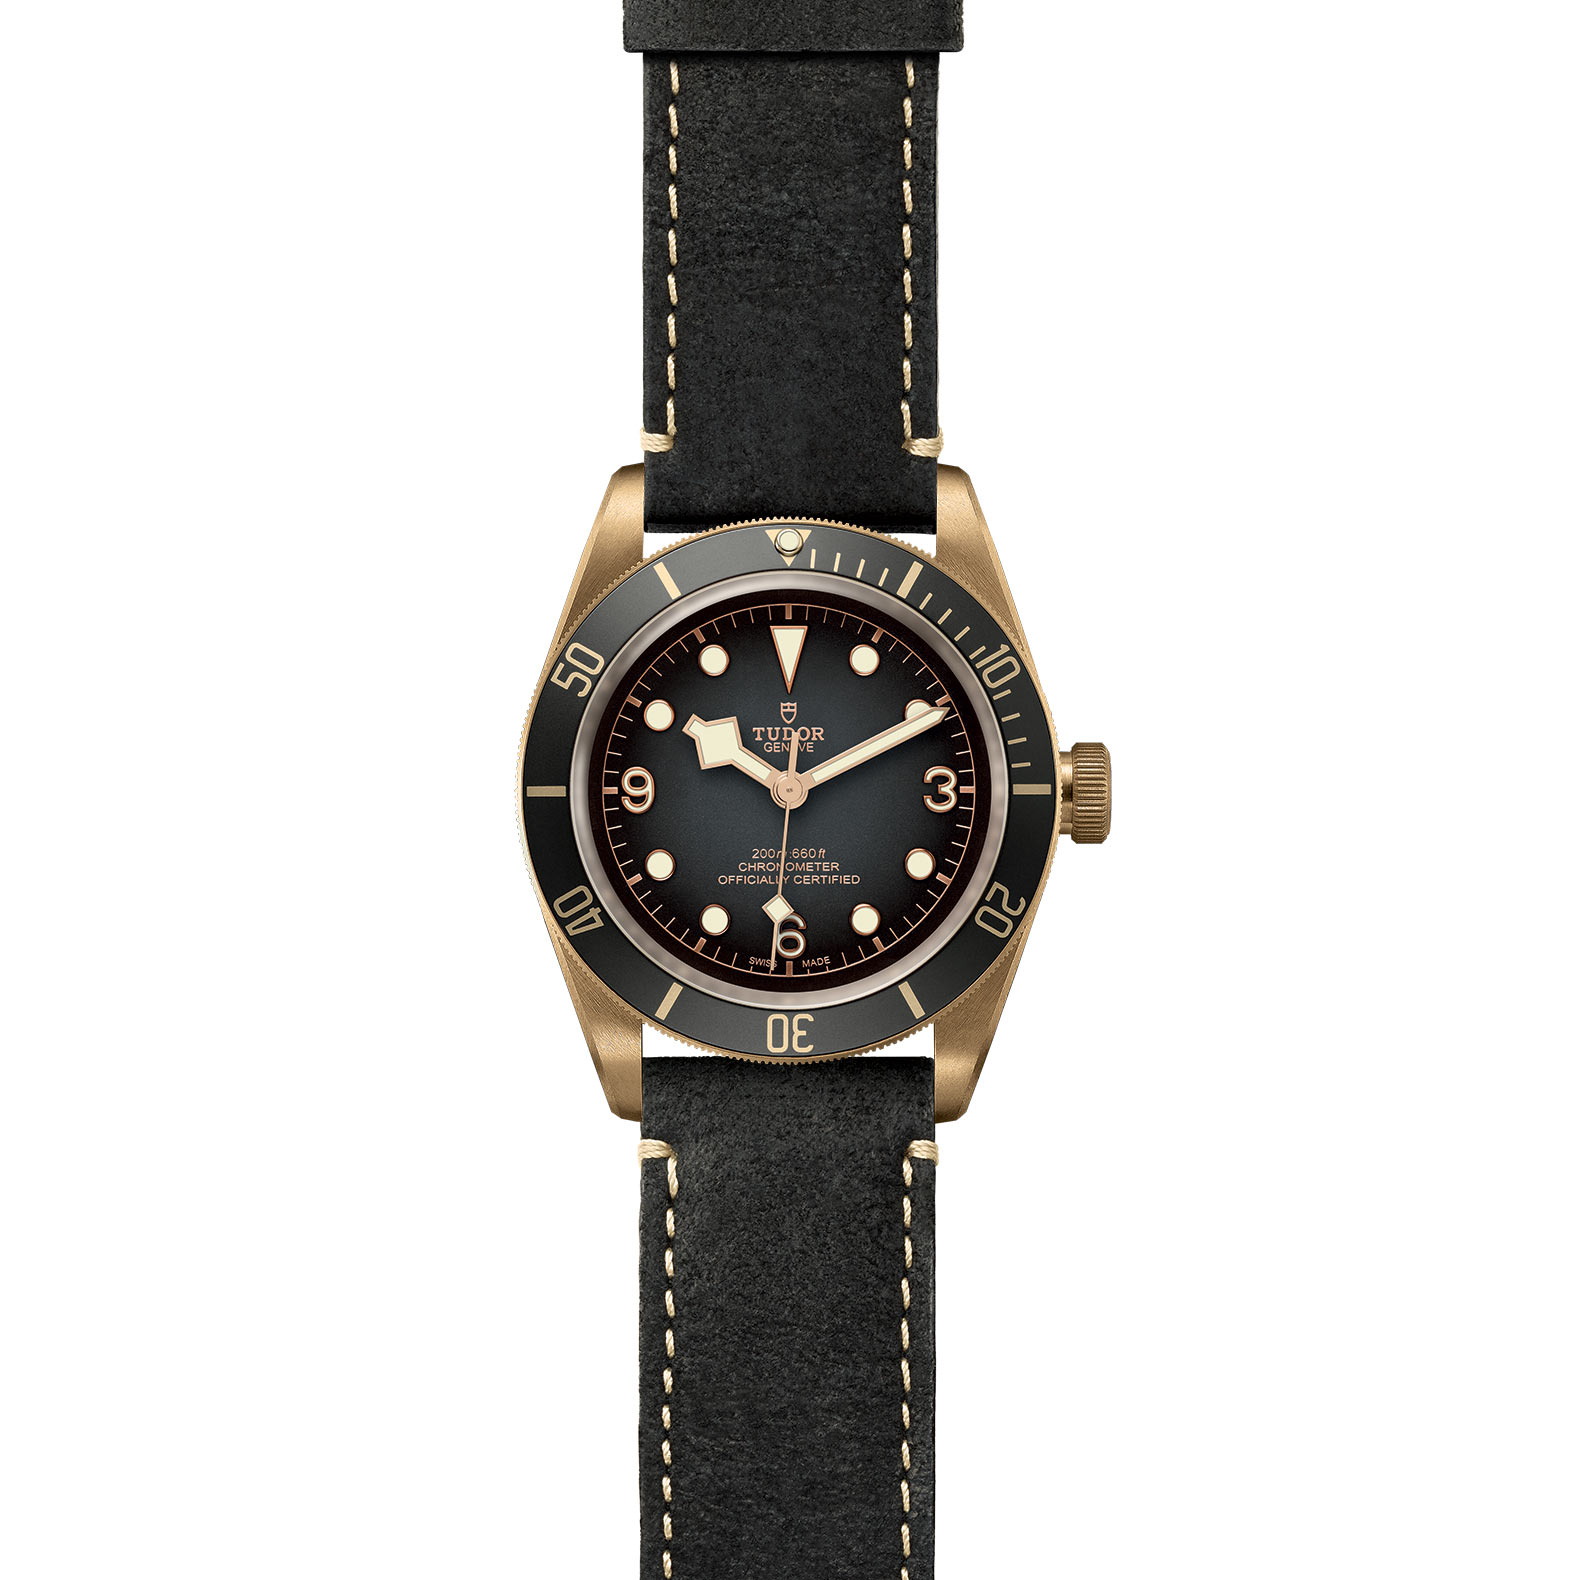 TUDOR Black Bay Bronze M79250BA 0001 Frontfacing